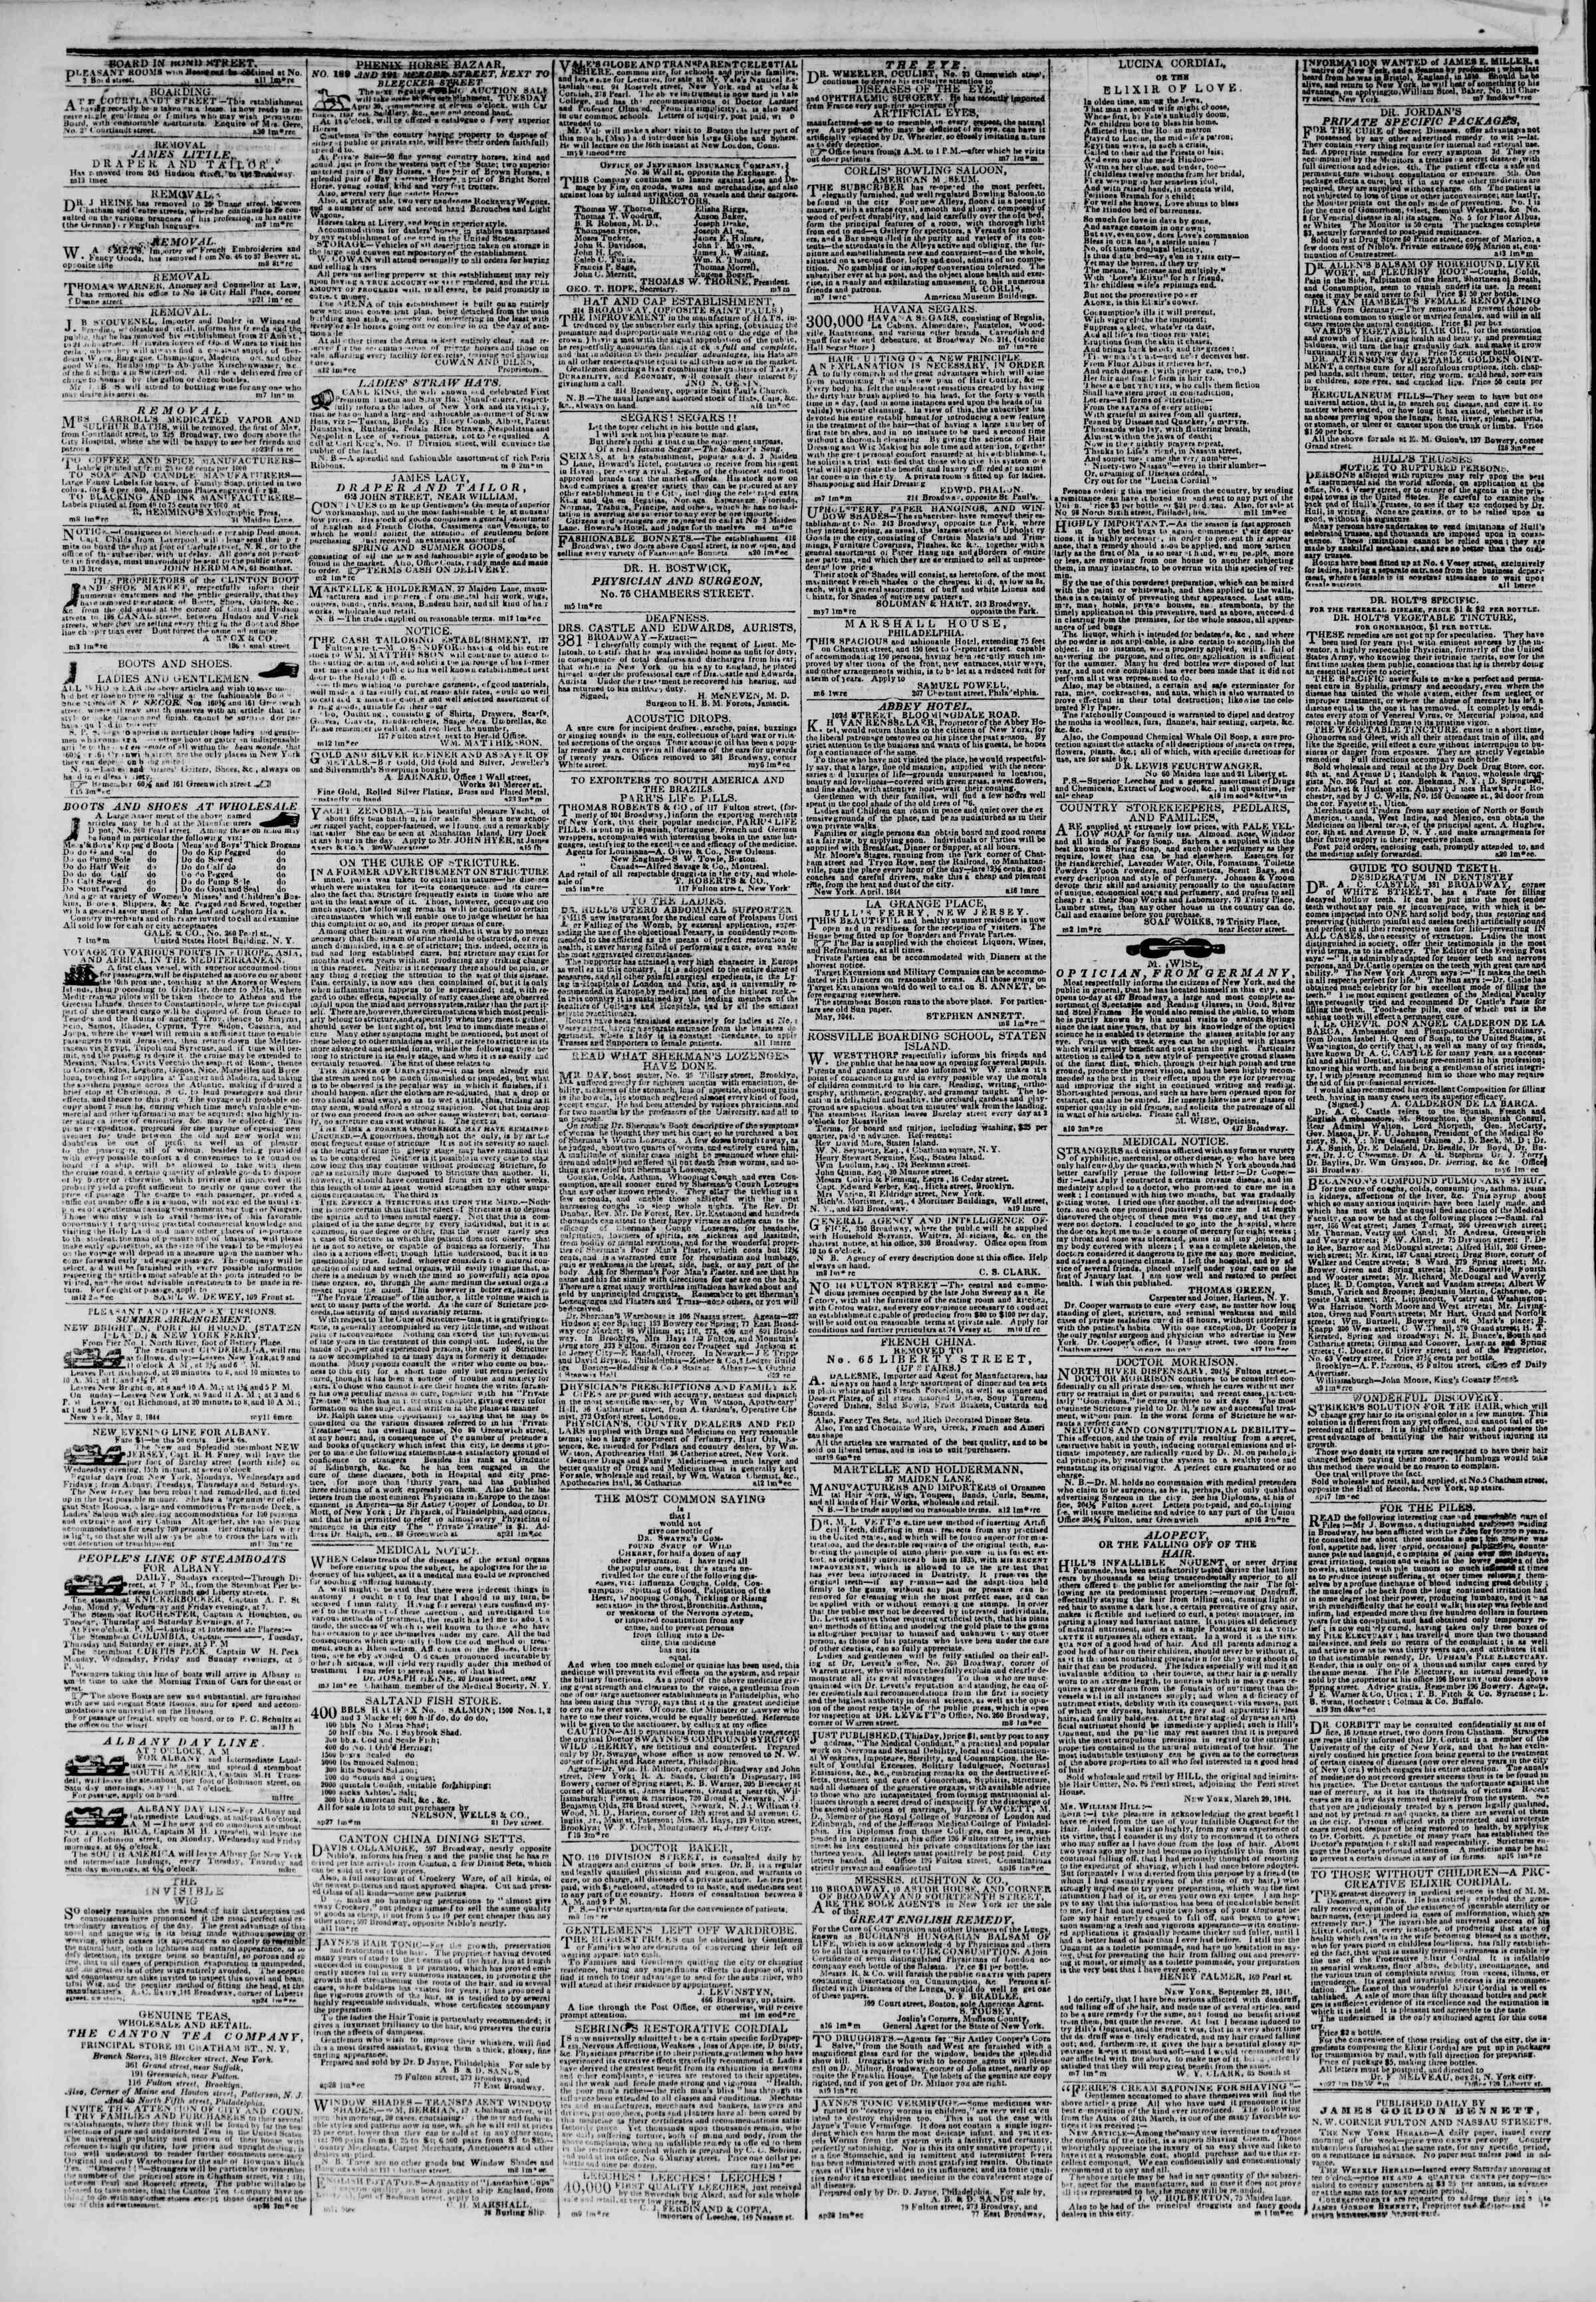 May 14, 1844 Tarihli The New York Herald Gazetesi Sayfa 4